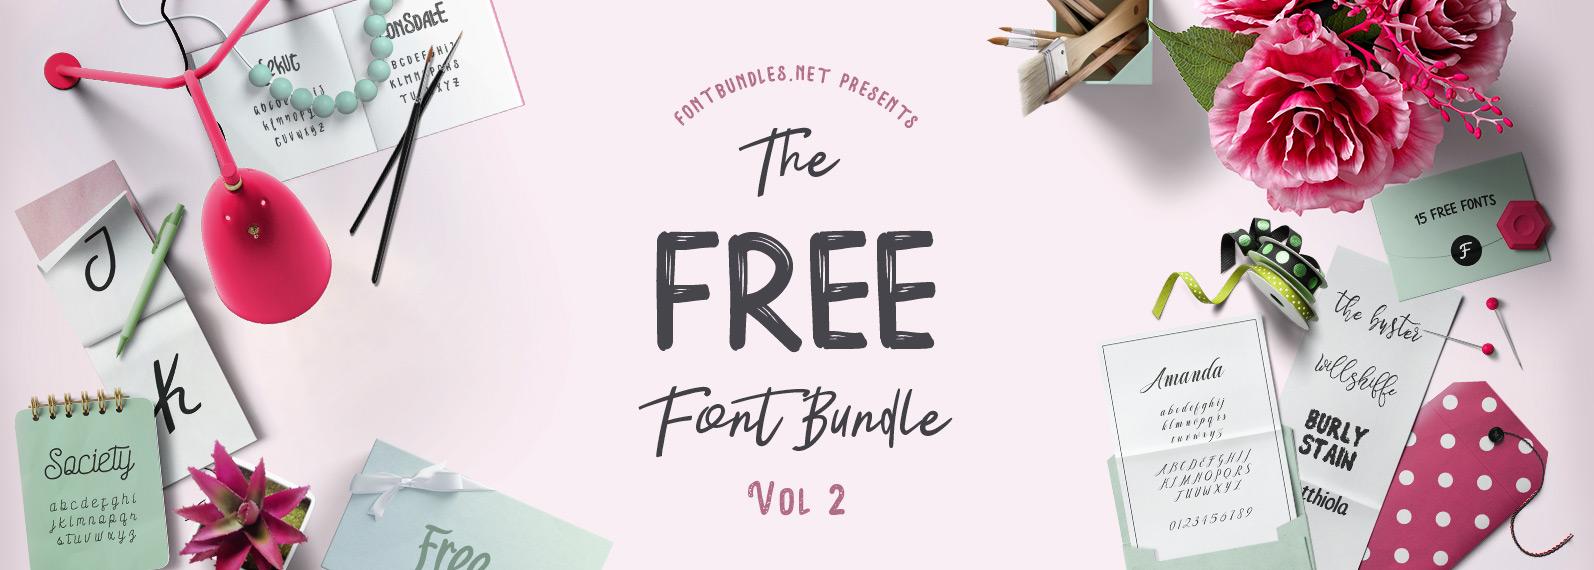 The Free Font Bundle Vol II Cover